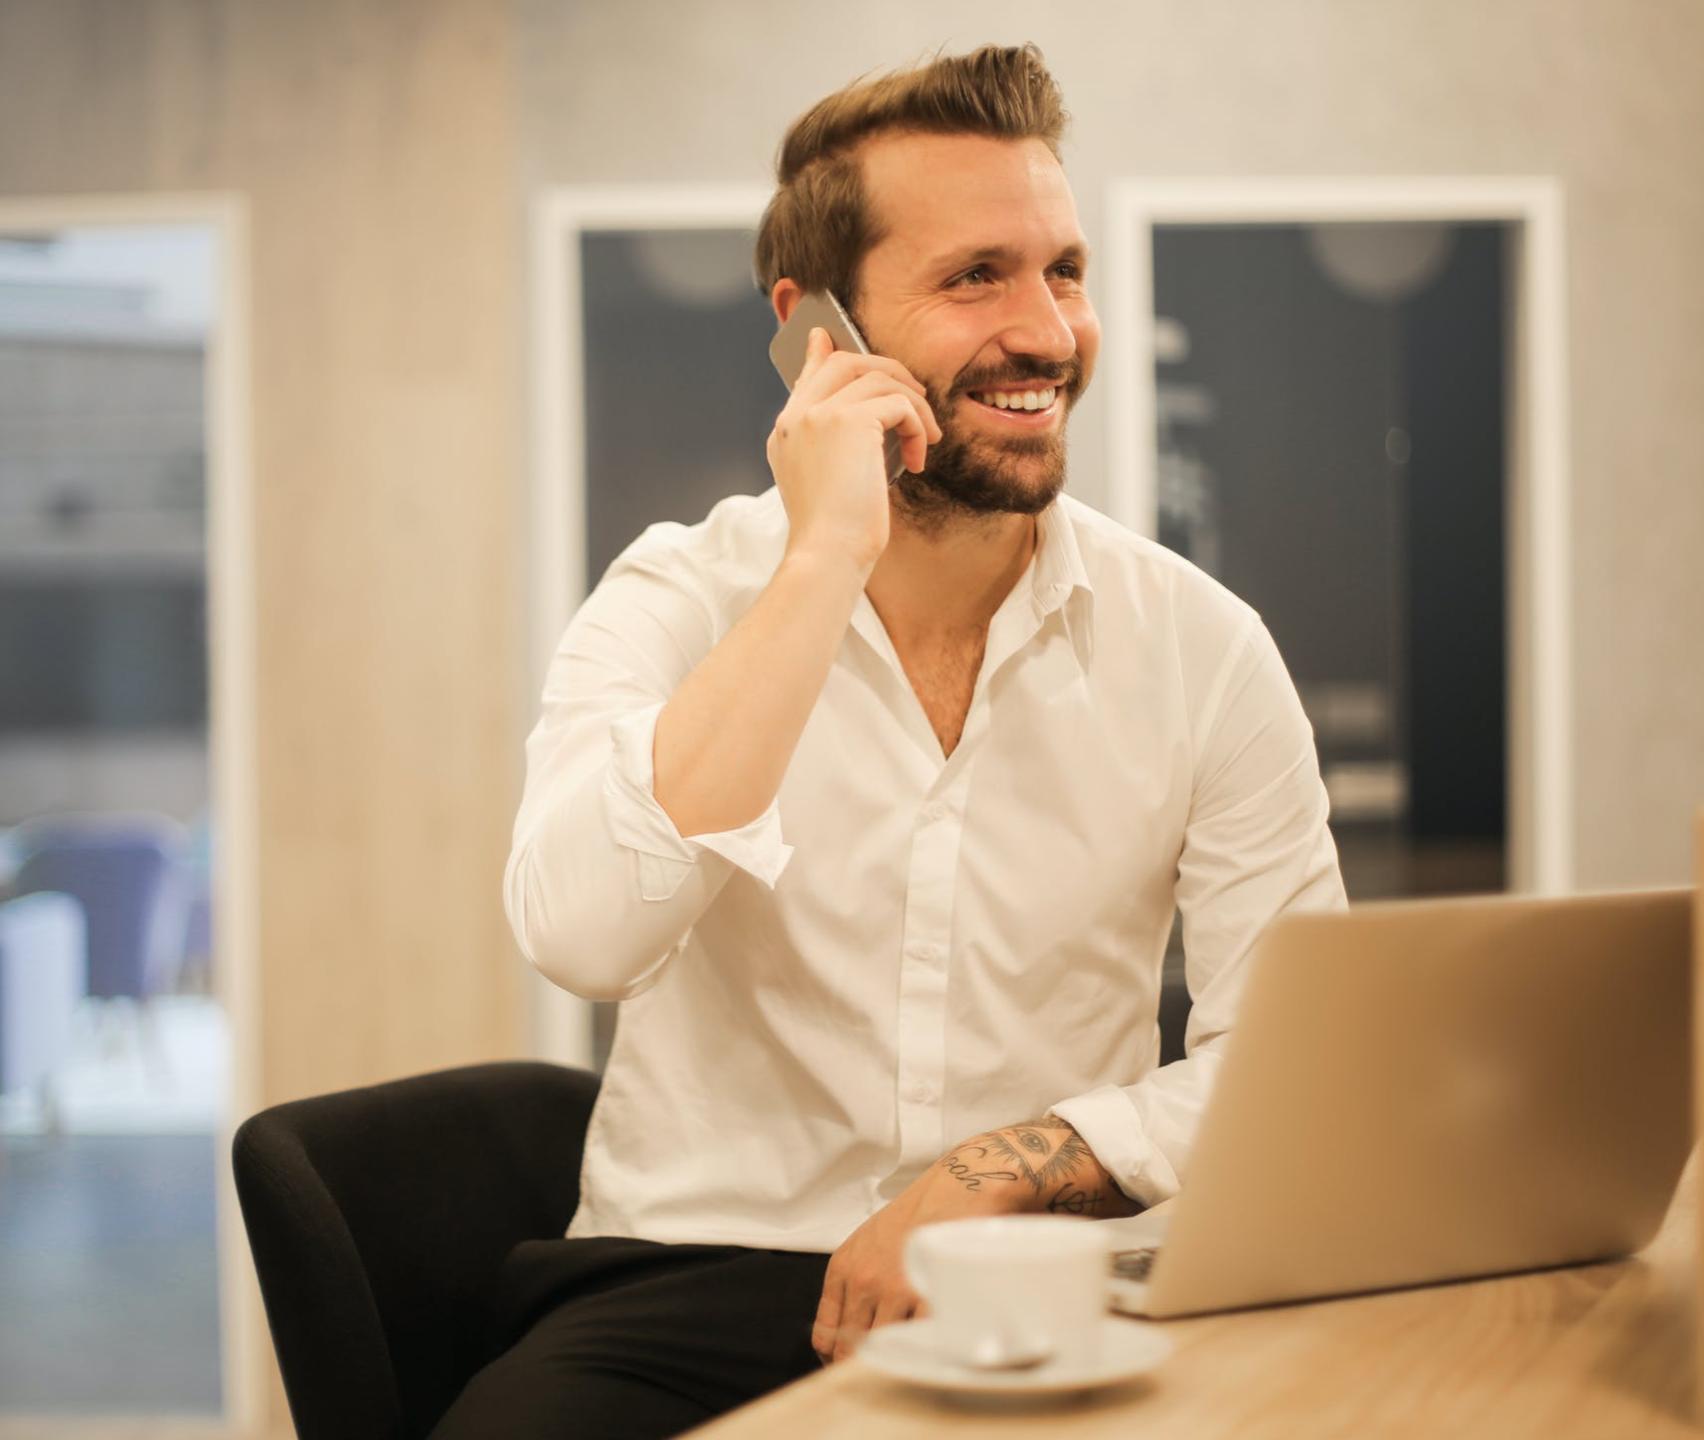 Doradca Klienta - Key Account Manager